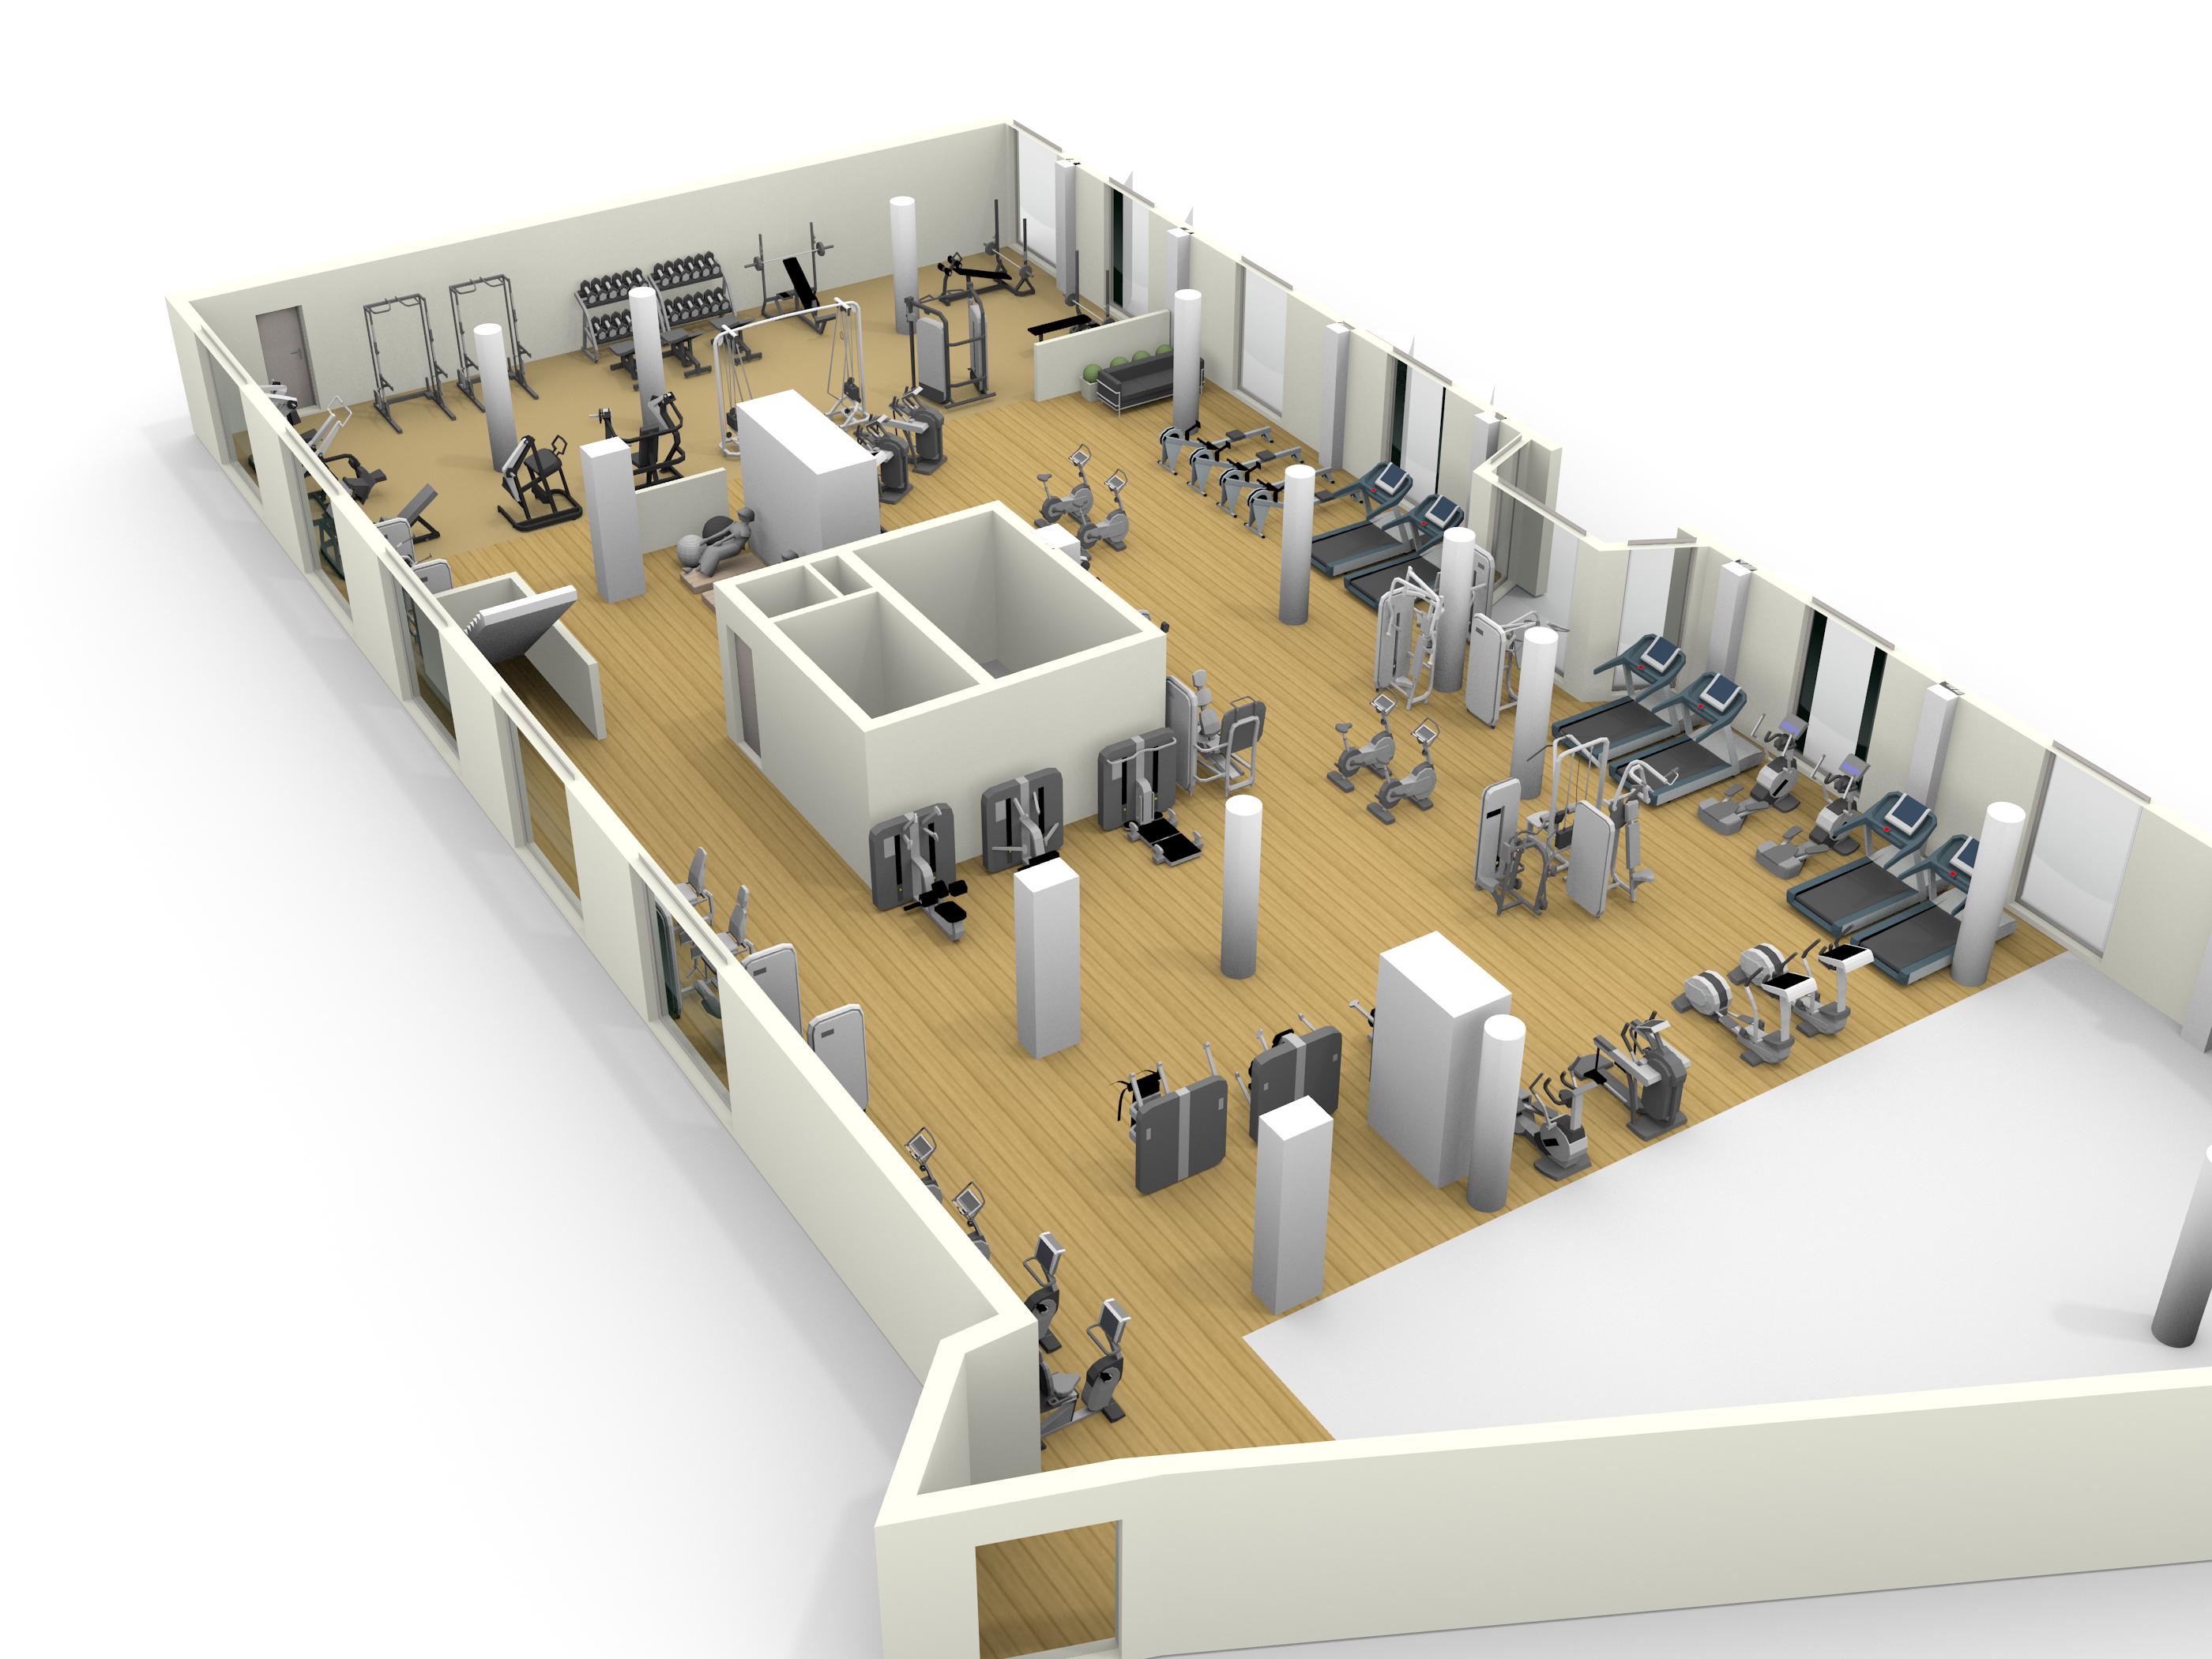 3d Rendering Of A Floor Plan Made With Floorplanner Com Interior Rendering Floor Plans Spatial Concepts